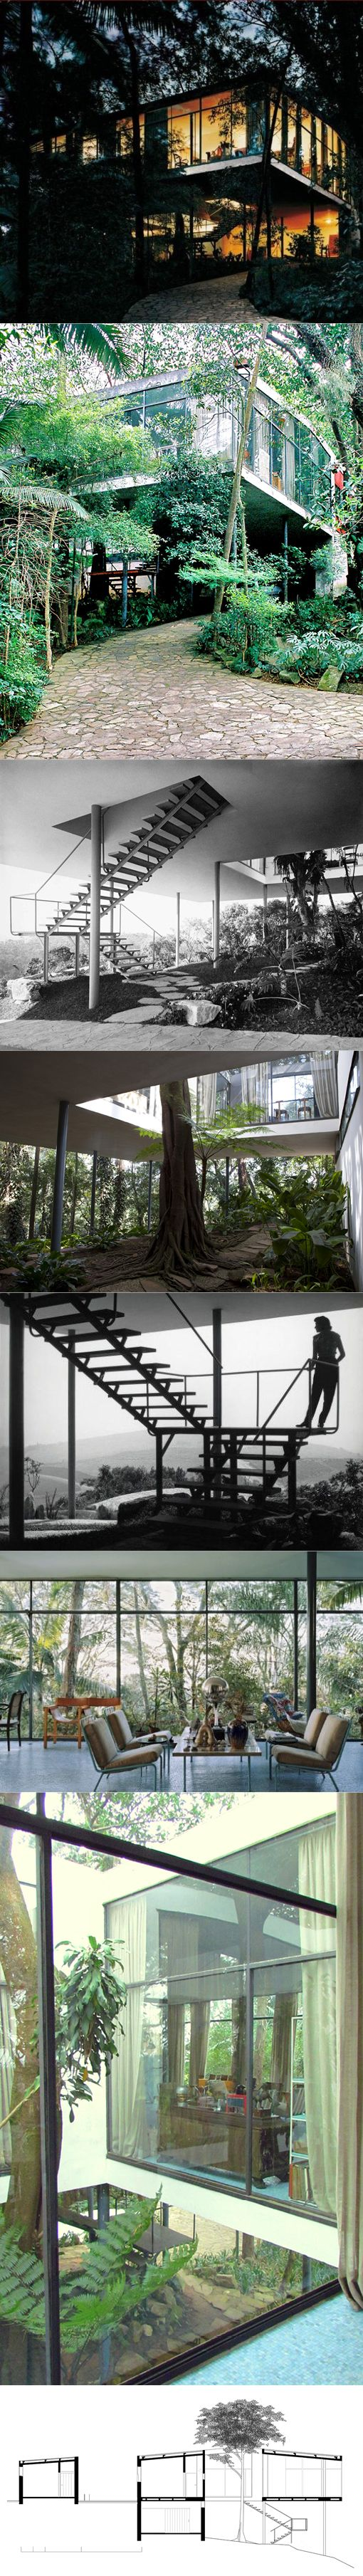 1951 Lina Bo Bardi - Casa de Vidro / São Paulo Brazil / concrete steel glass / Glass House